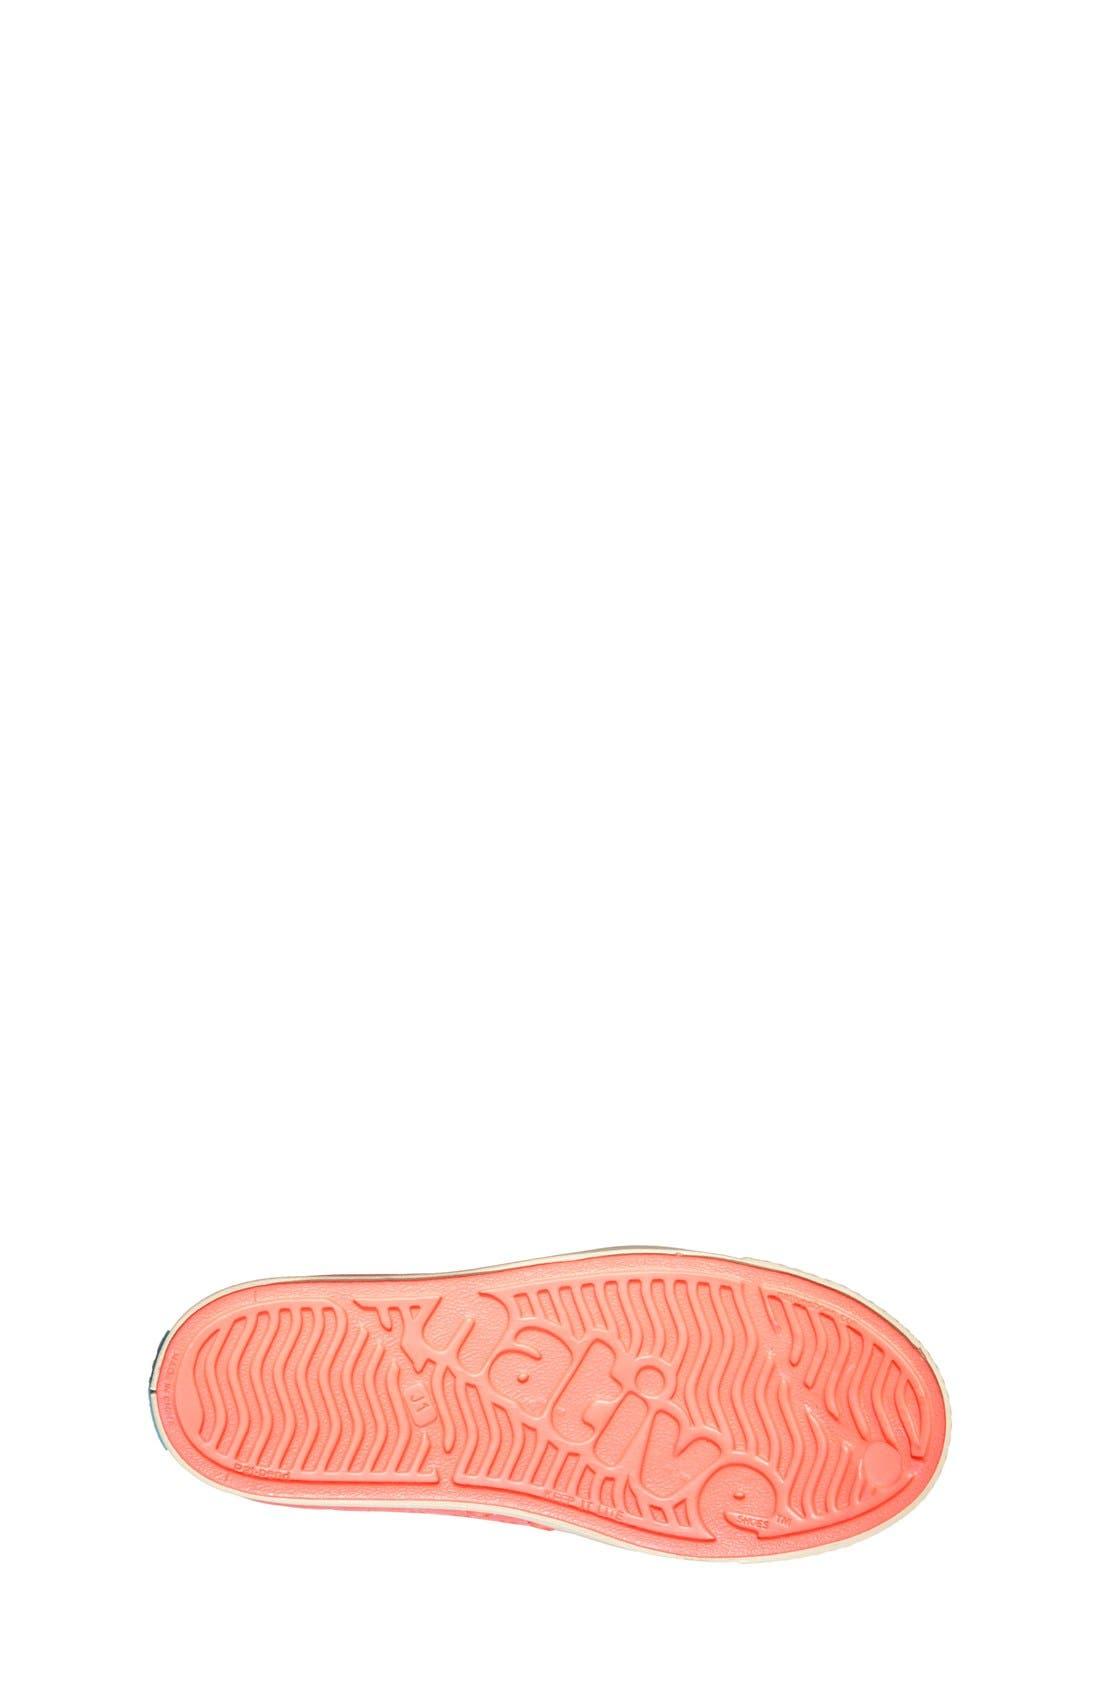 'Jefferson' Water Friendly Slip-On Sneaker,                             Alternate thumbnail 221, color,